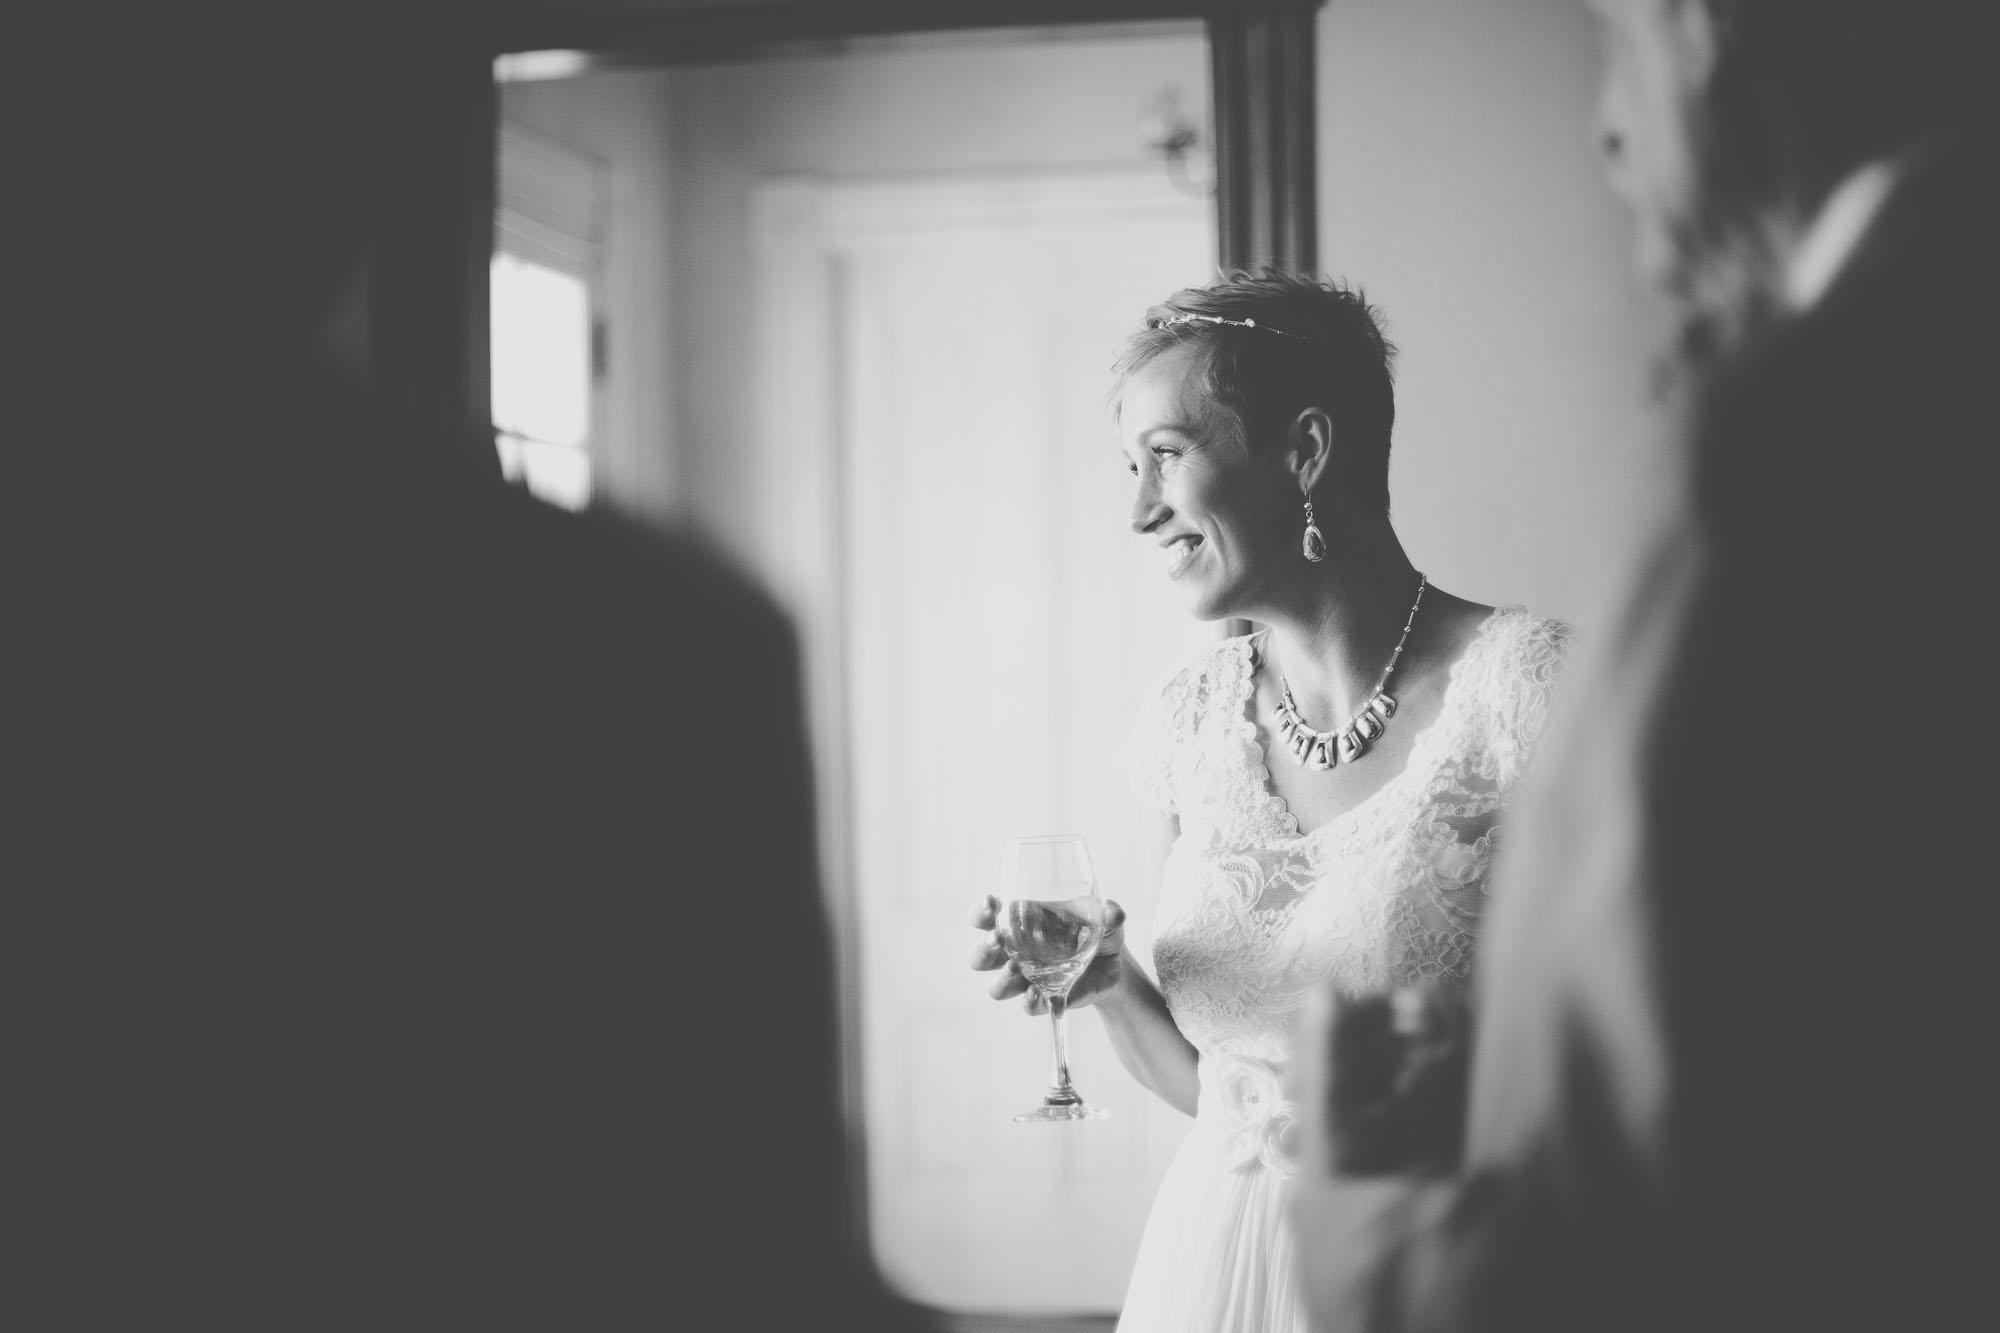 Gretchen_Gause_Petaluma_Olympias_Valley_Wedding_Photo-128.jpg